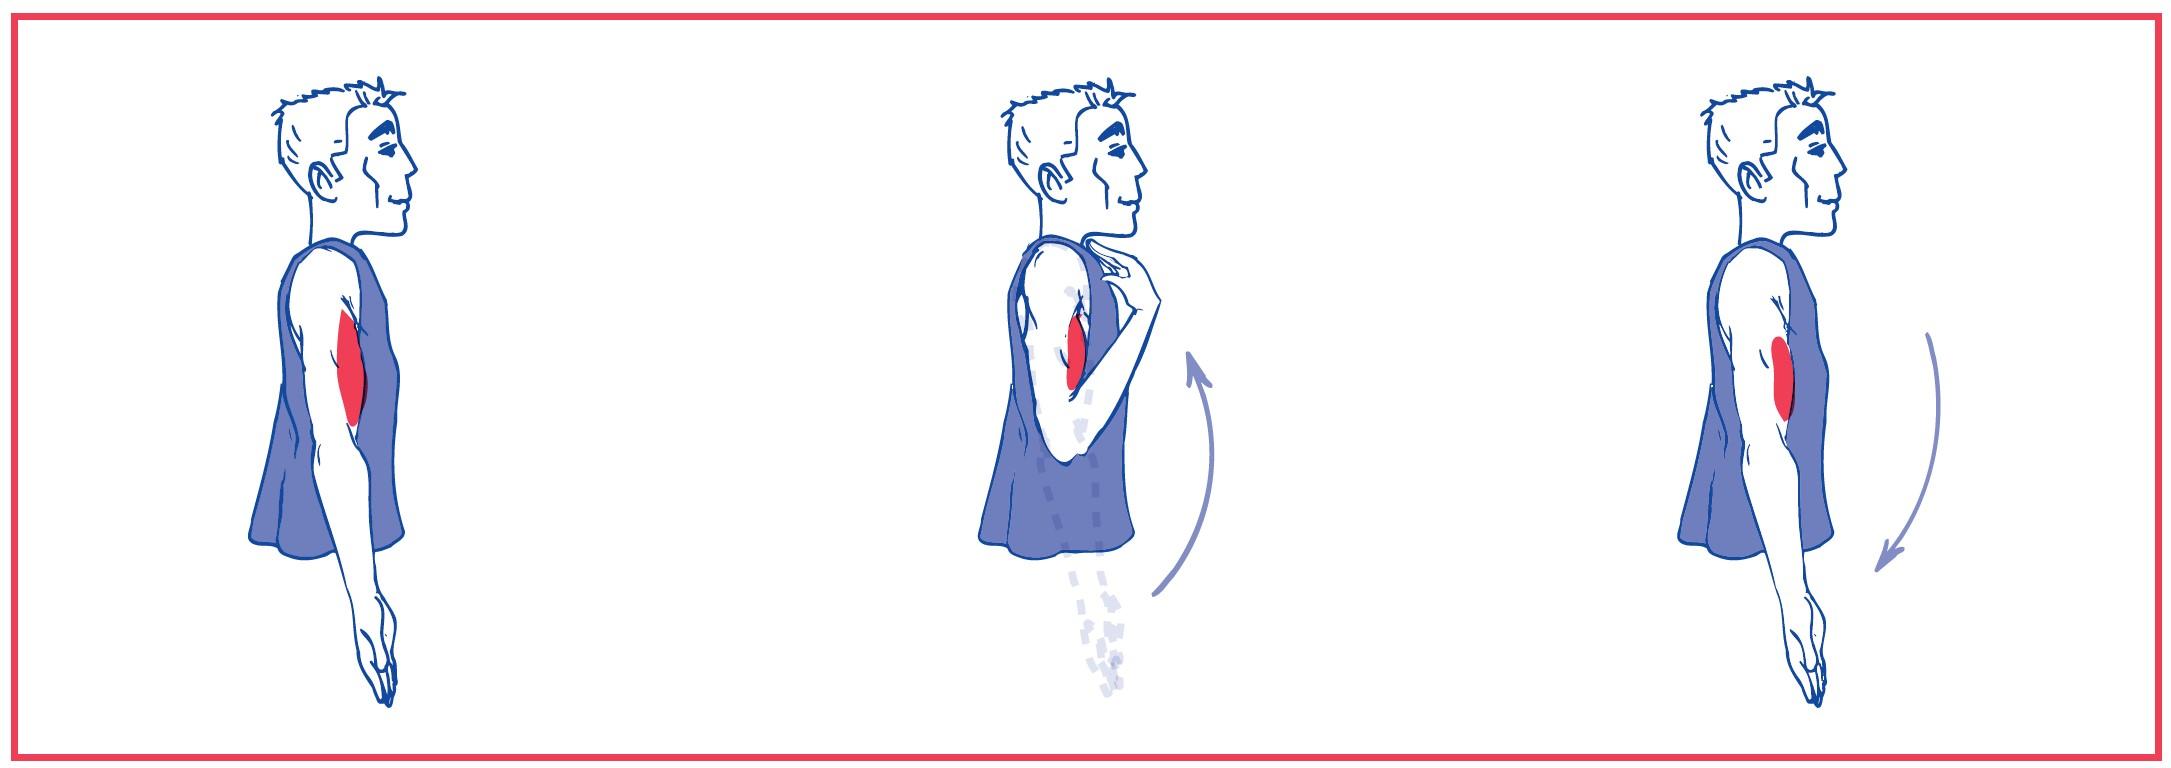 1. Free elbow flexion against gravity